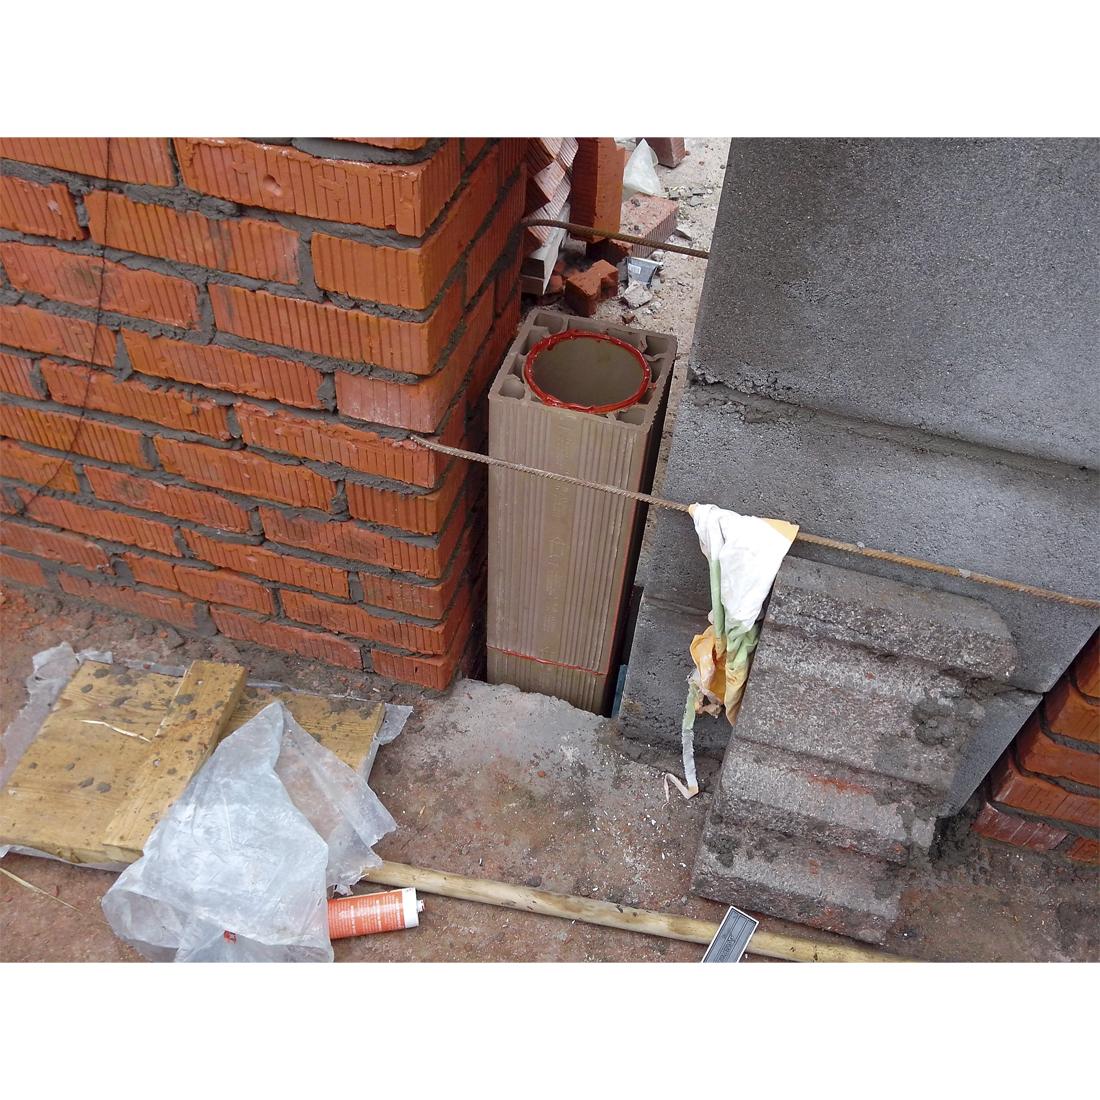 Дымоход из кирпича своими руками: кладка, устройство, схема 58